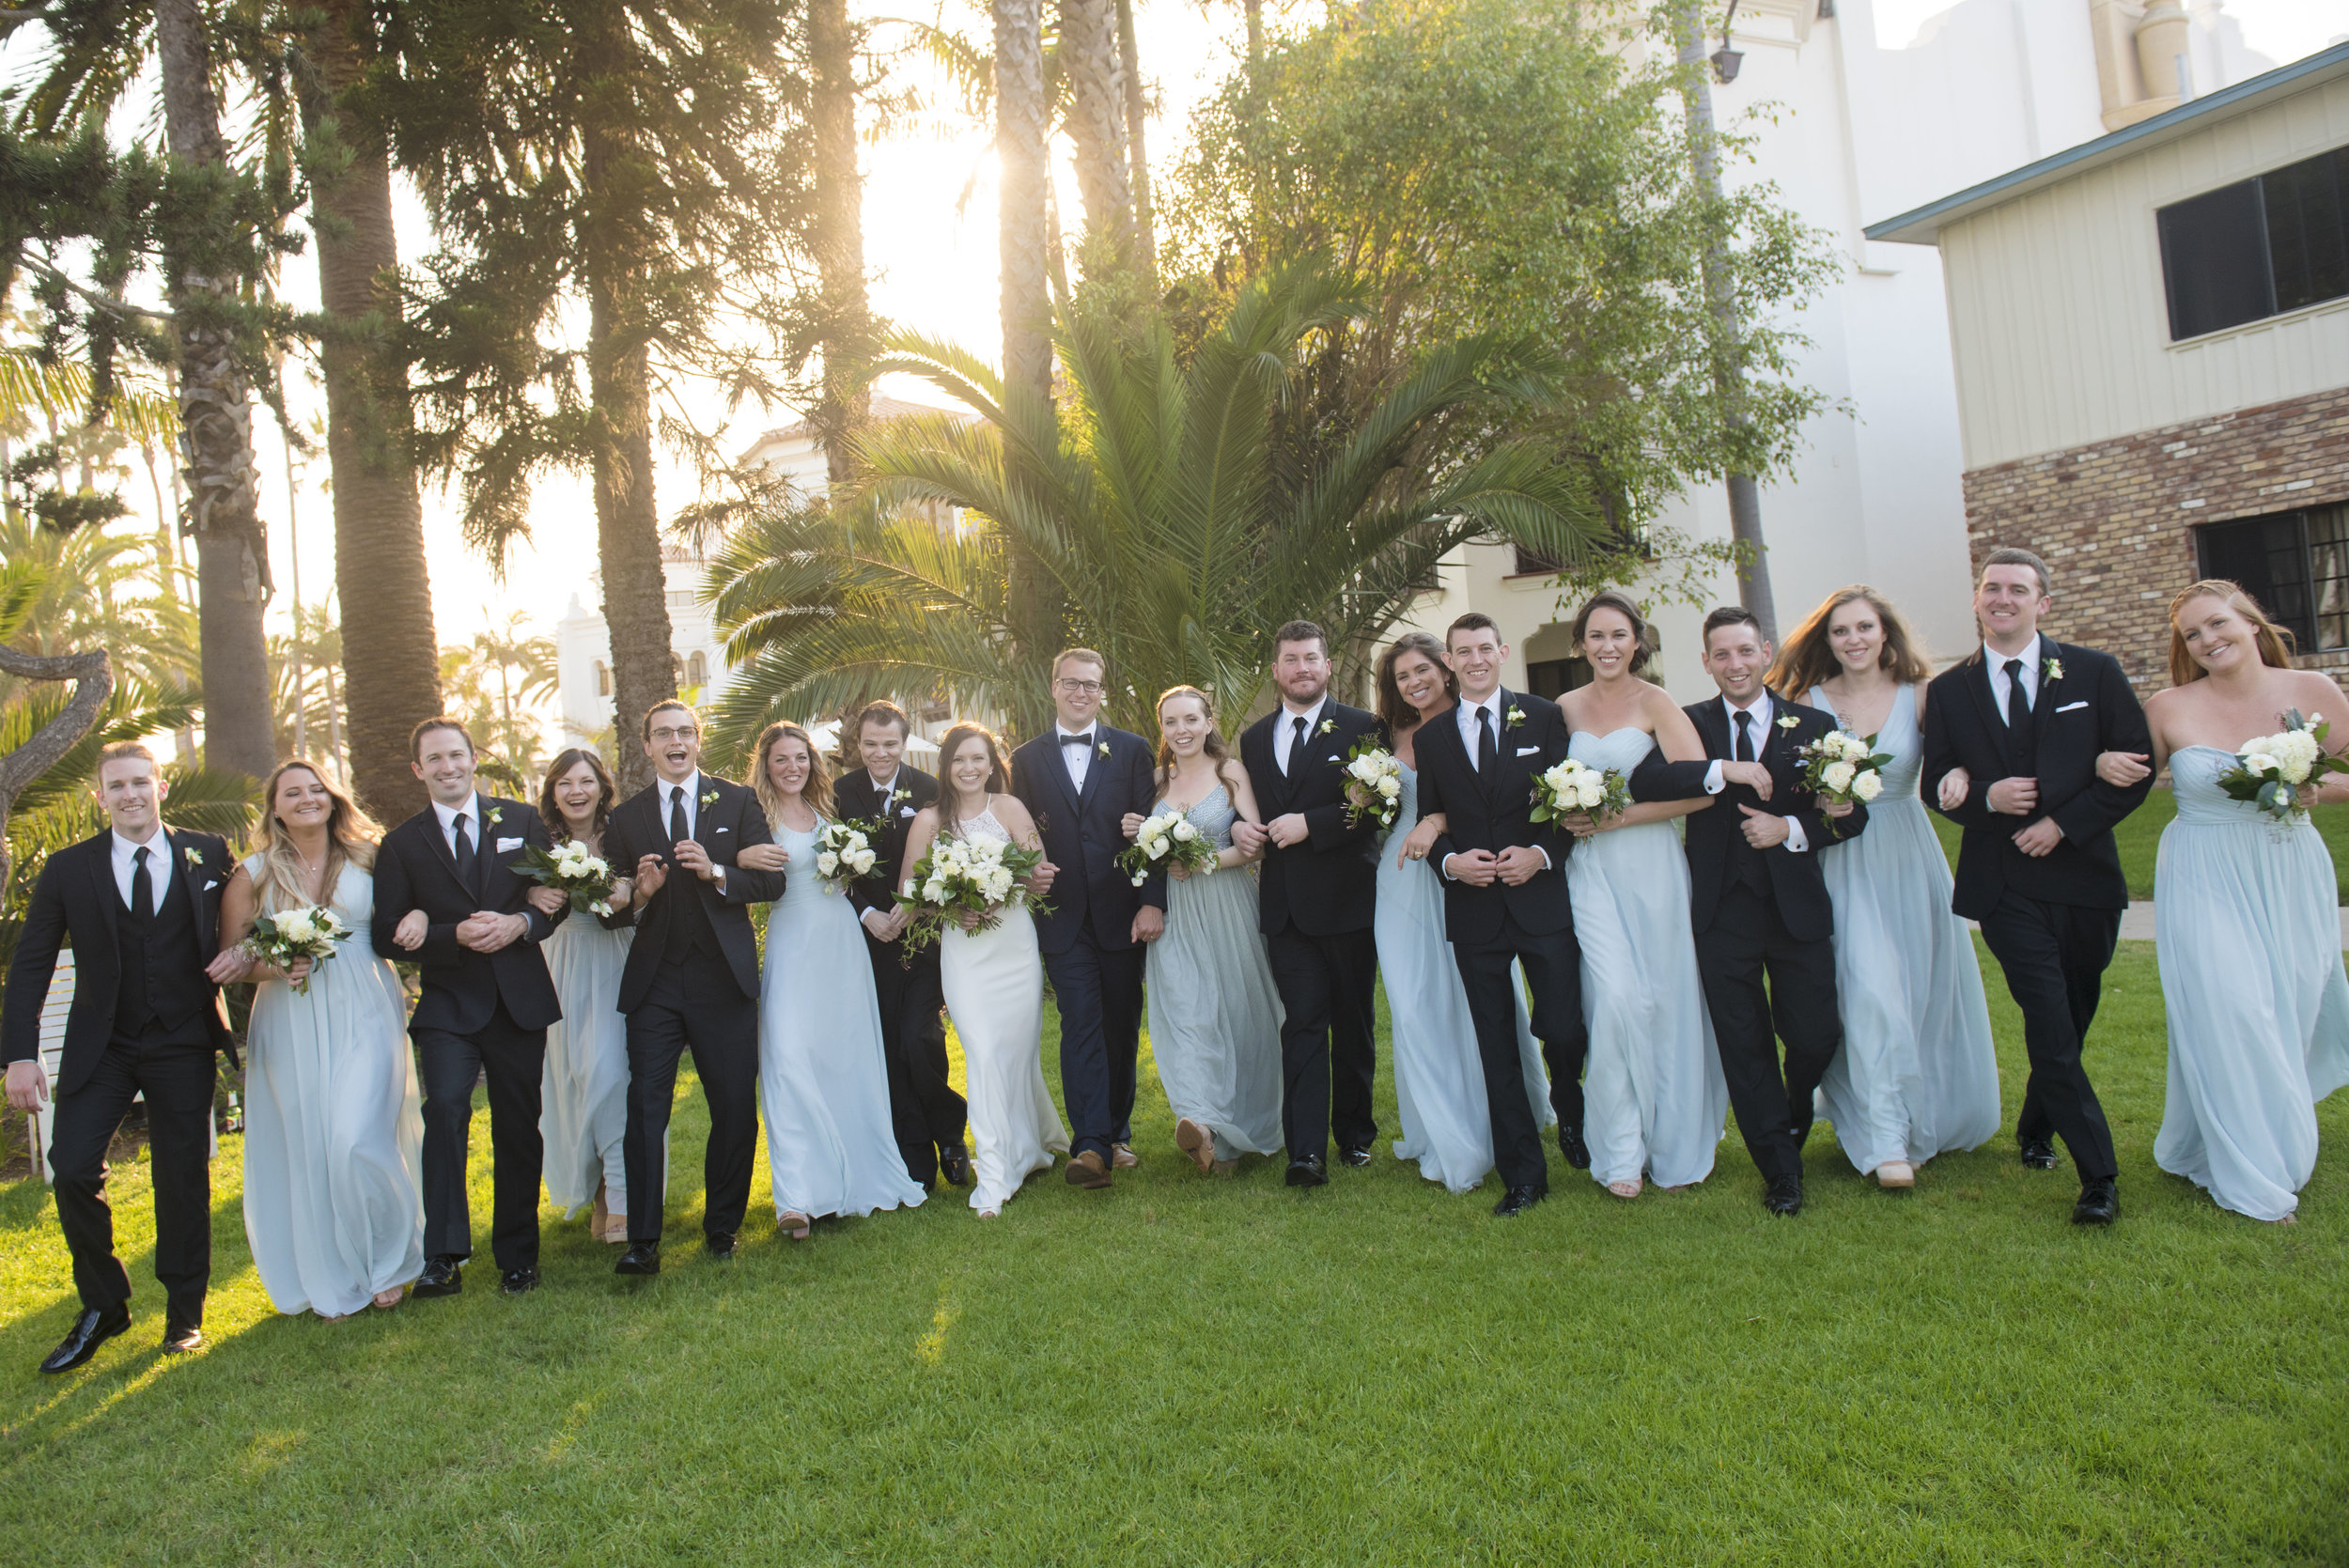 www.santabarbarawedding.com   ByCherry Photography   Felici Events   Convivo Restaurant   Bridal Party